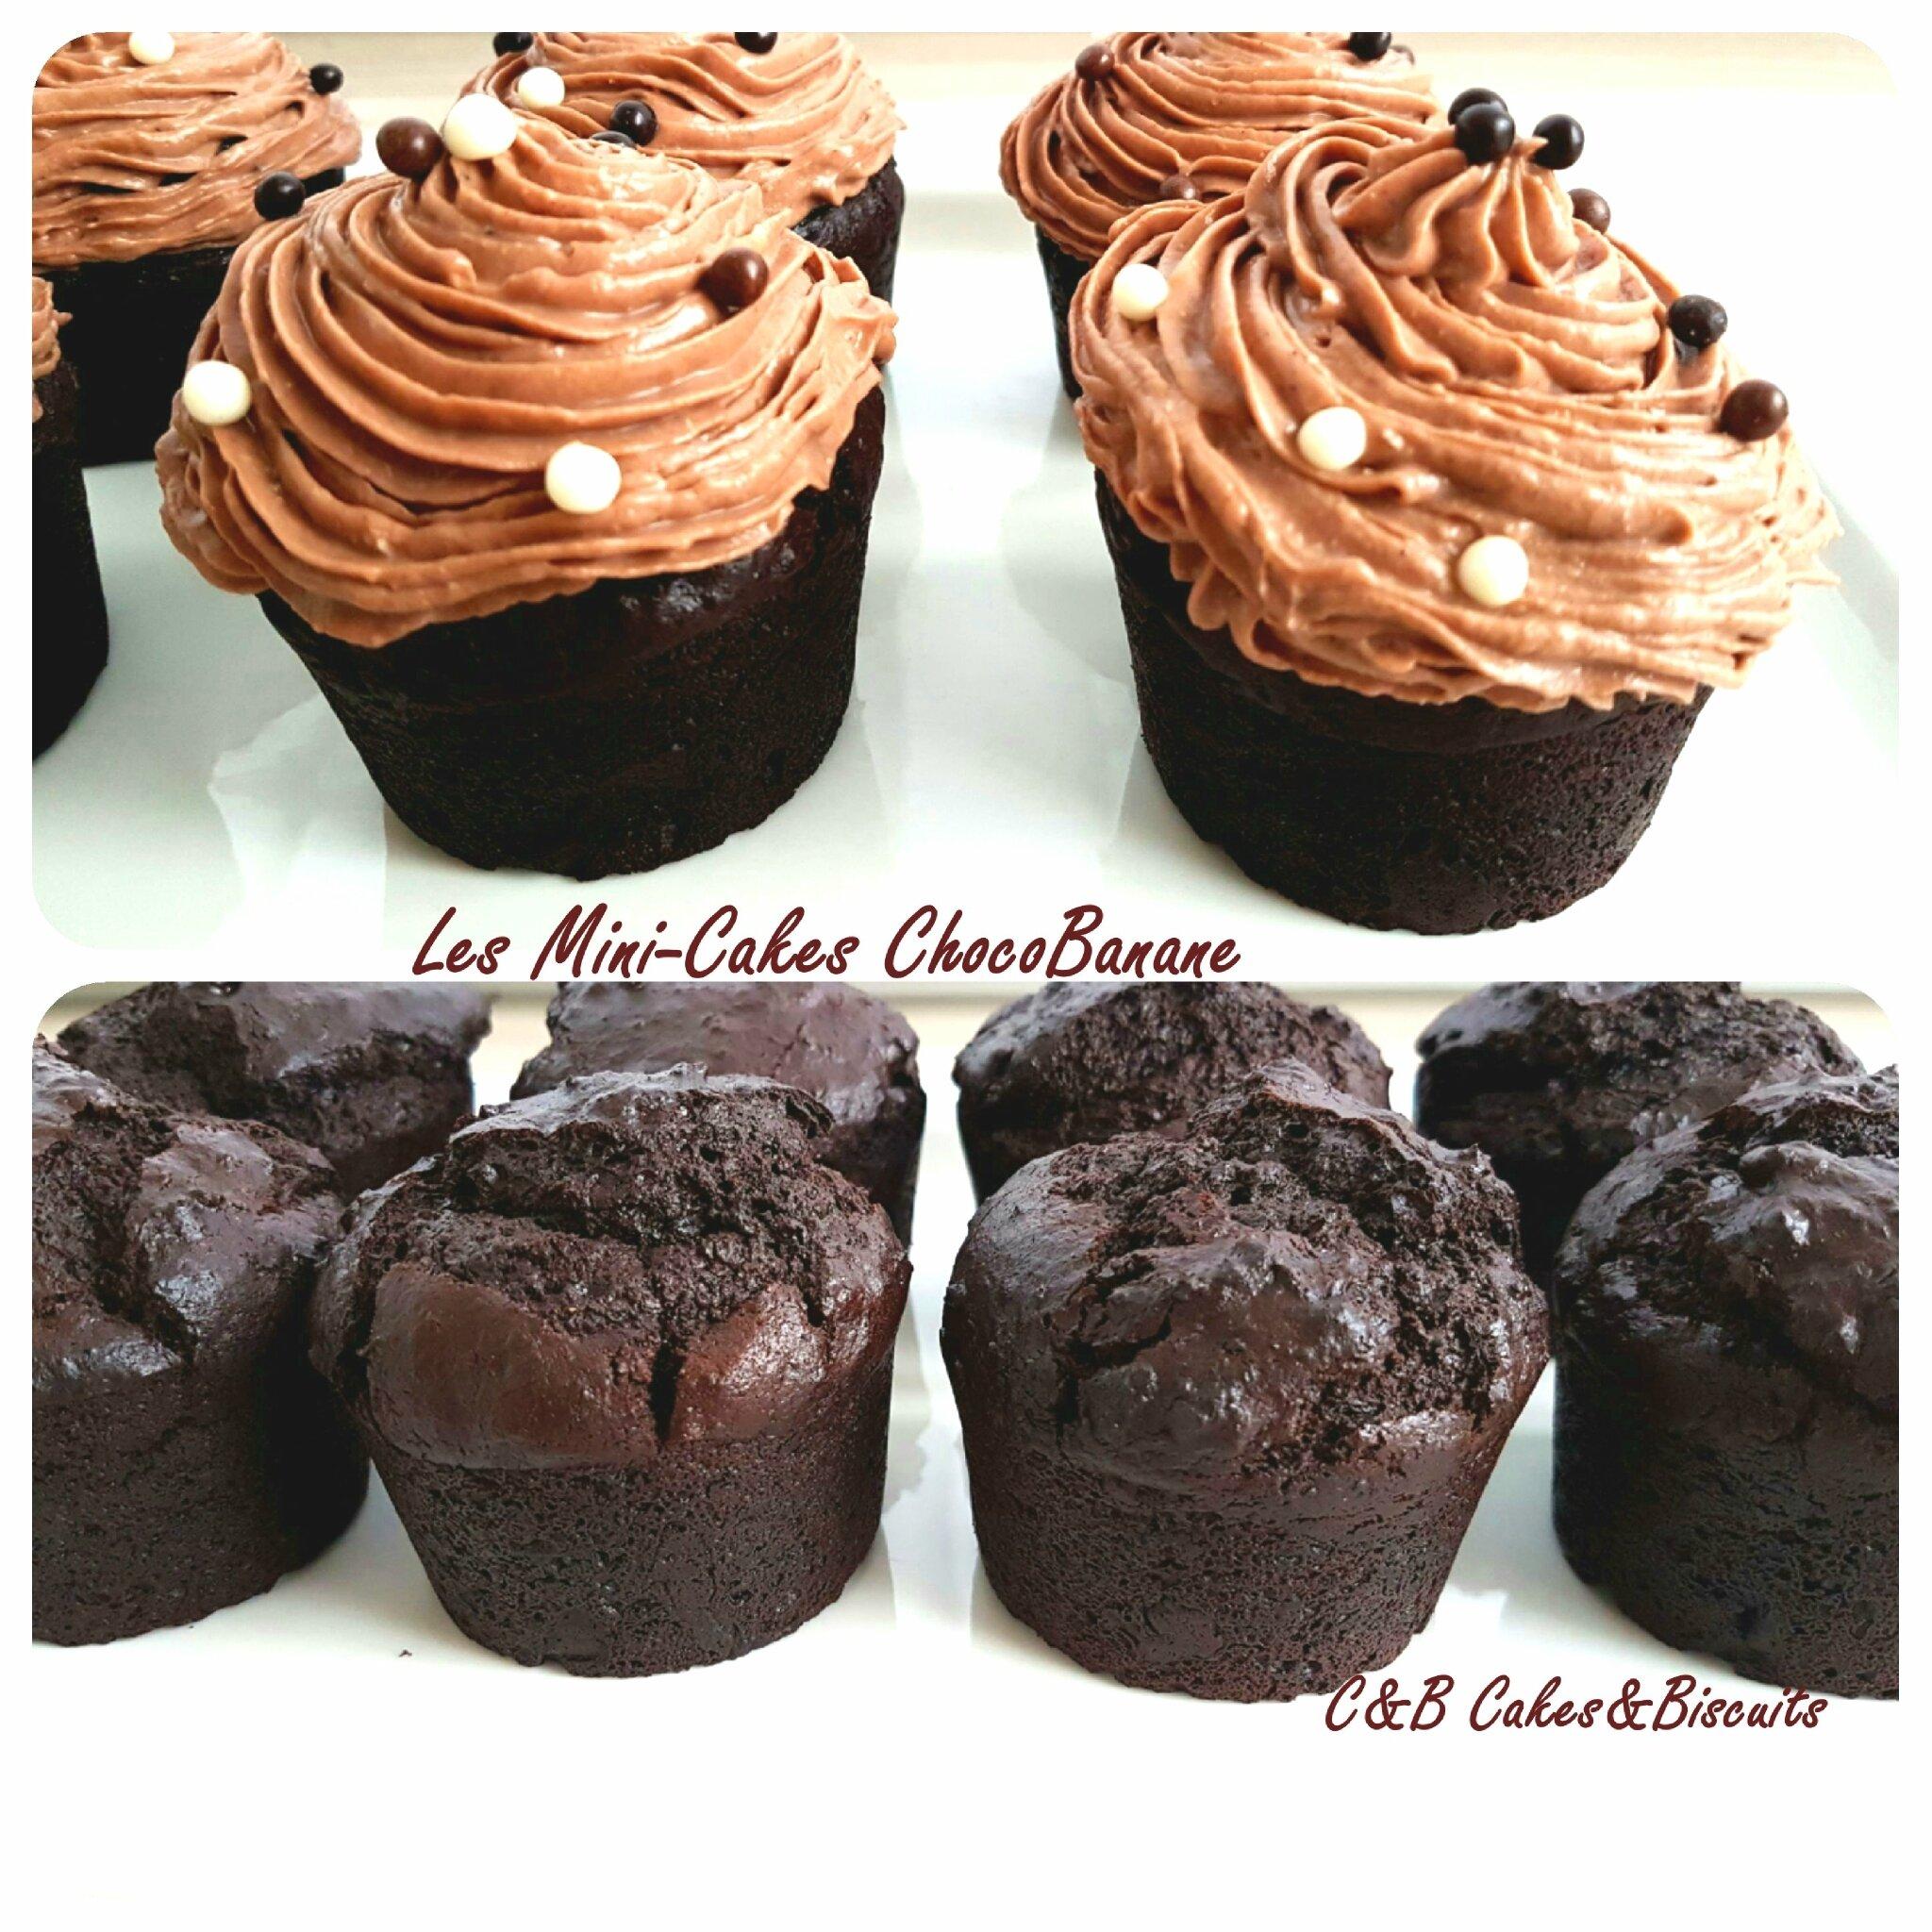 Les Mini-Cakes ChocoBanane